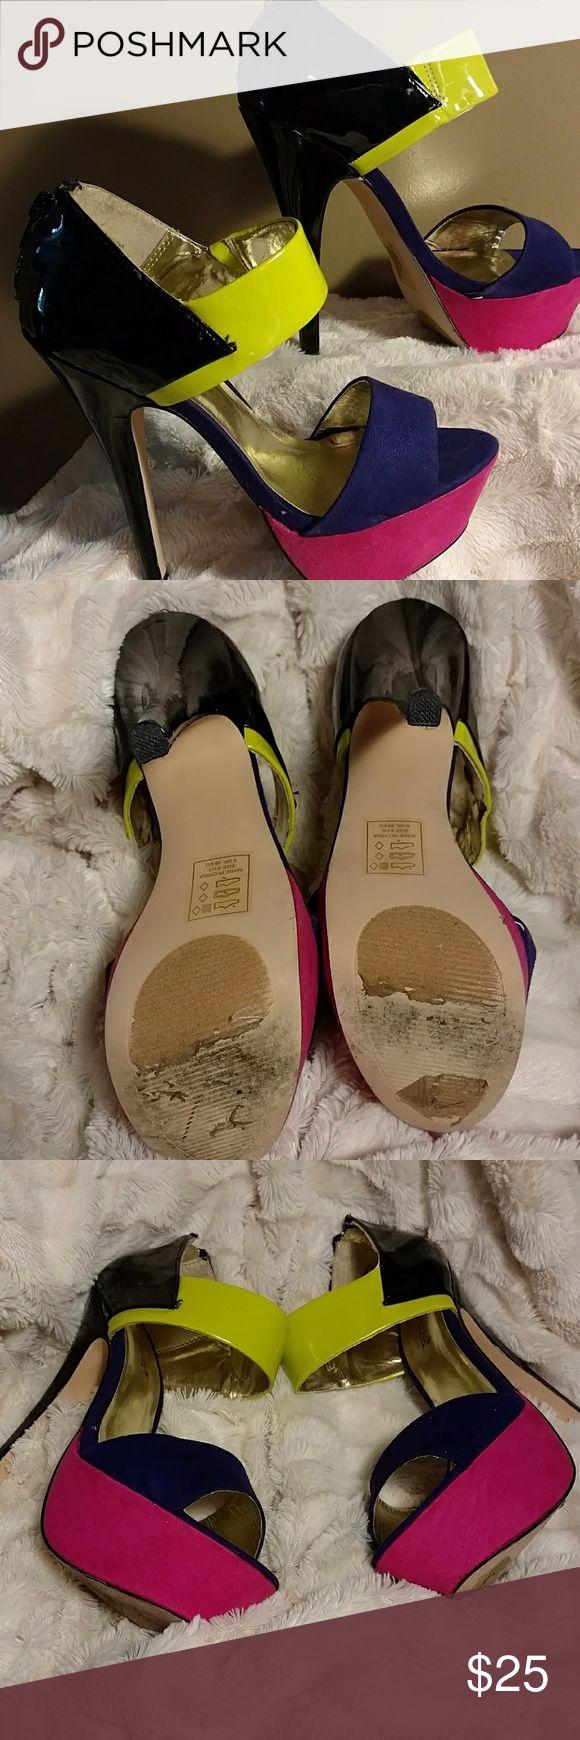 Women high heels Sexy multi color high heel shoe ShoeDazzle Shoes Heels